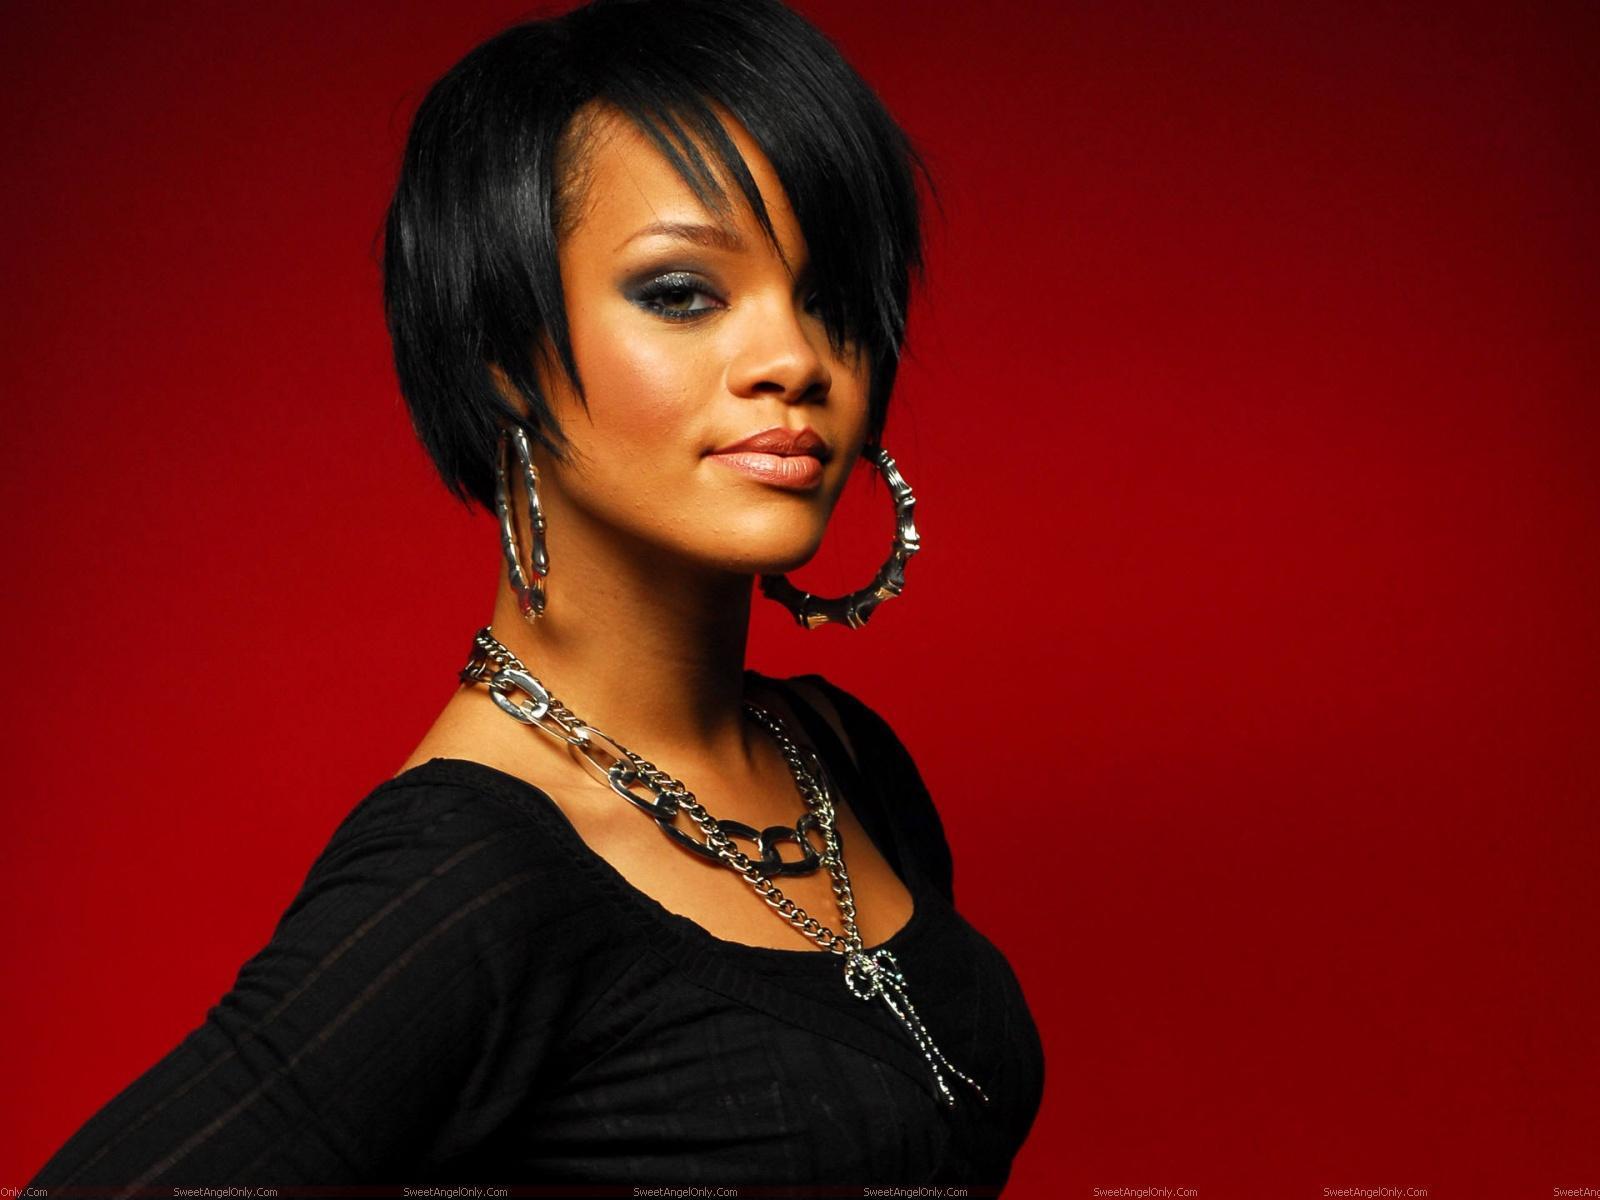 Rihanna: Rihanna Hot HD Wallpapers-1600x1200